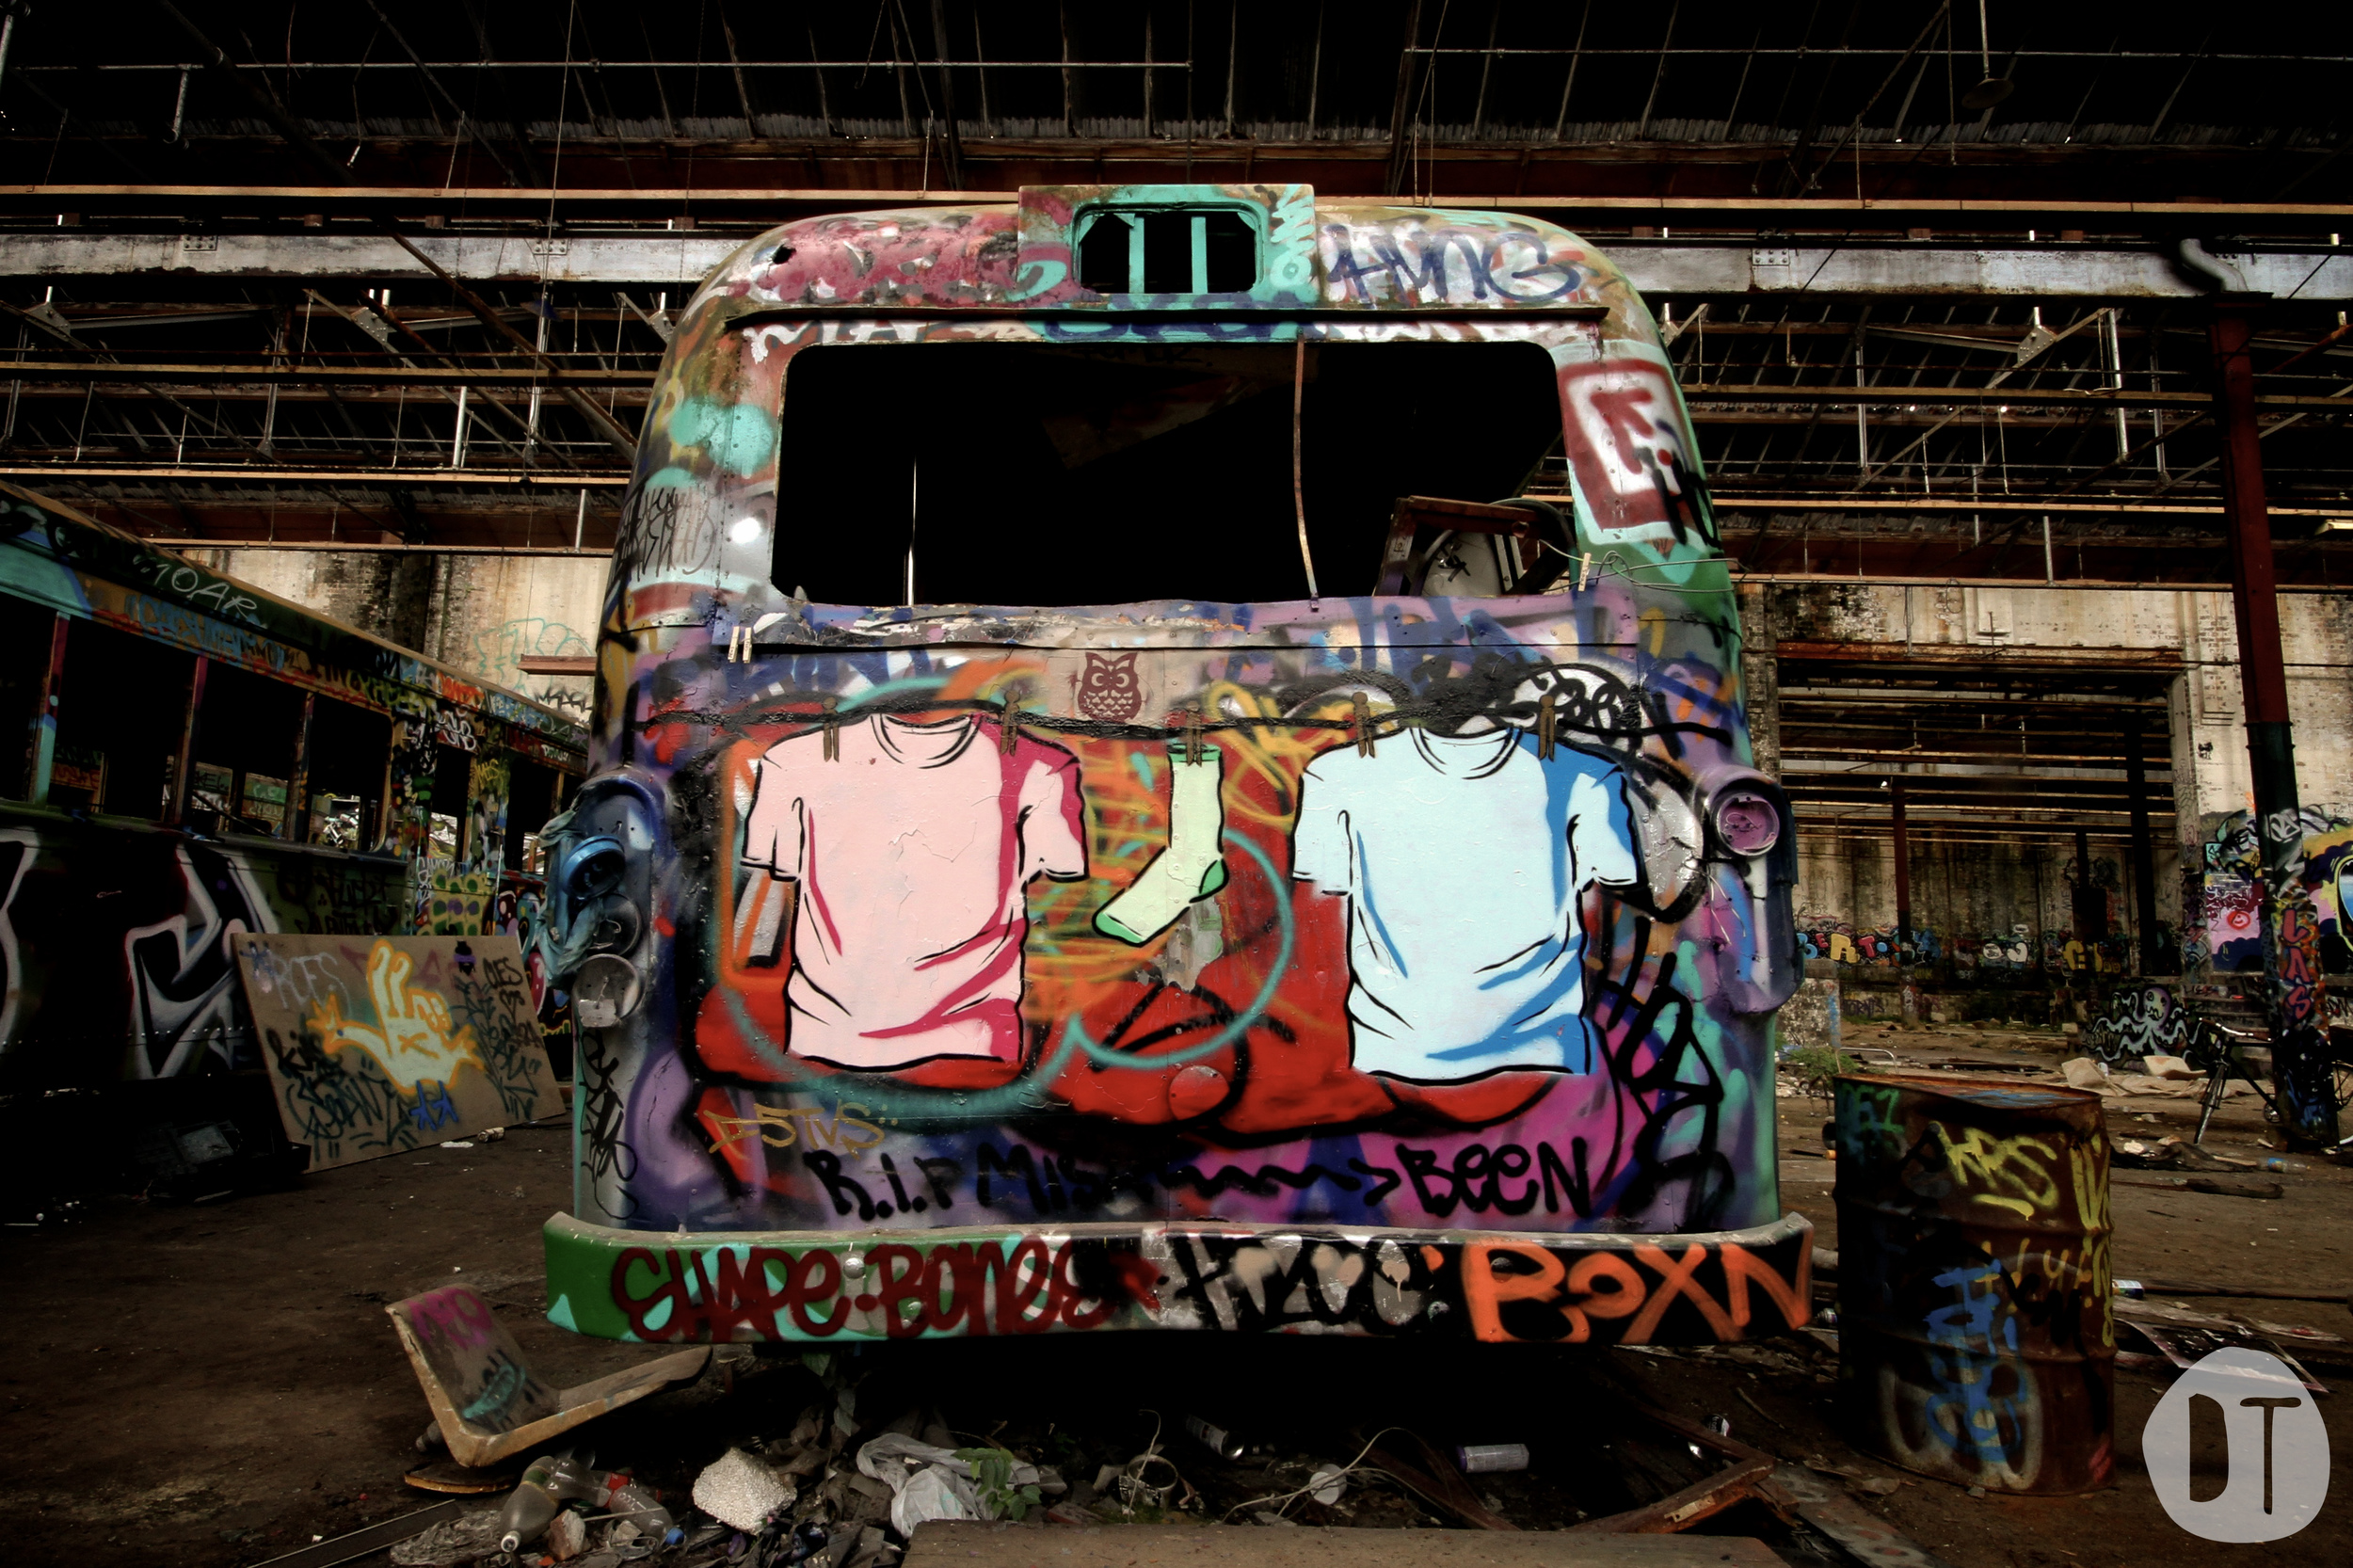 GLEBE TRAM SHEDS - GLEBE (2011)